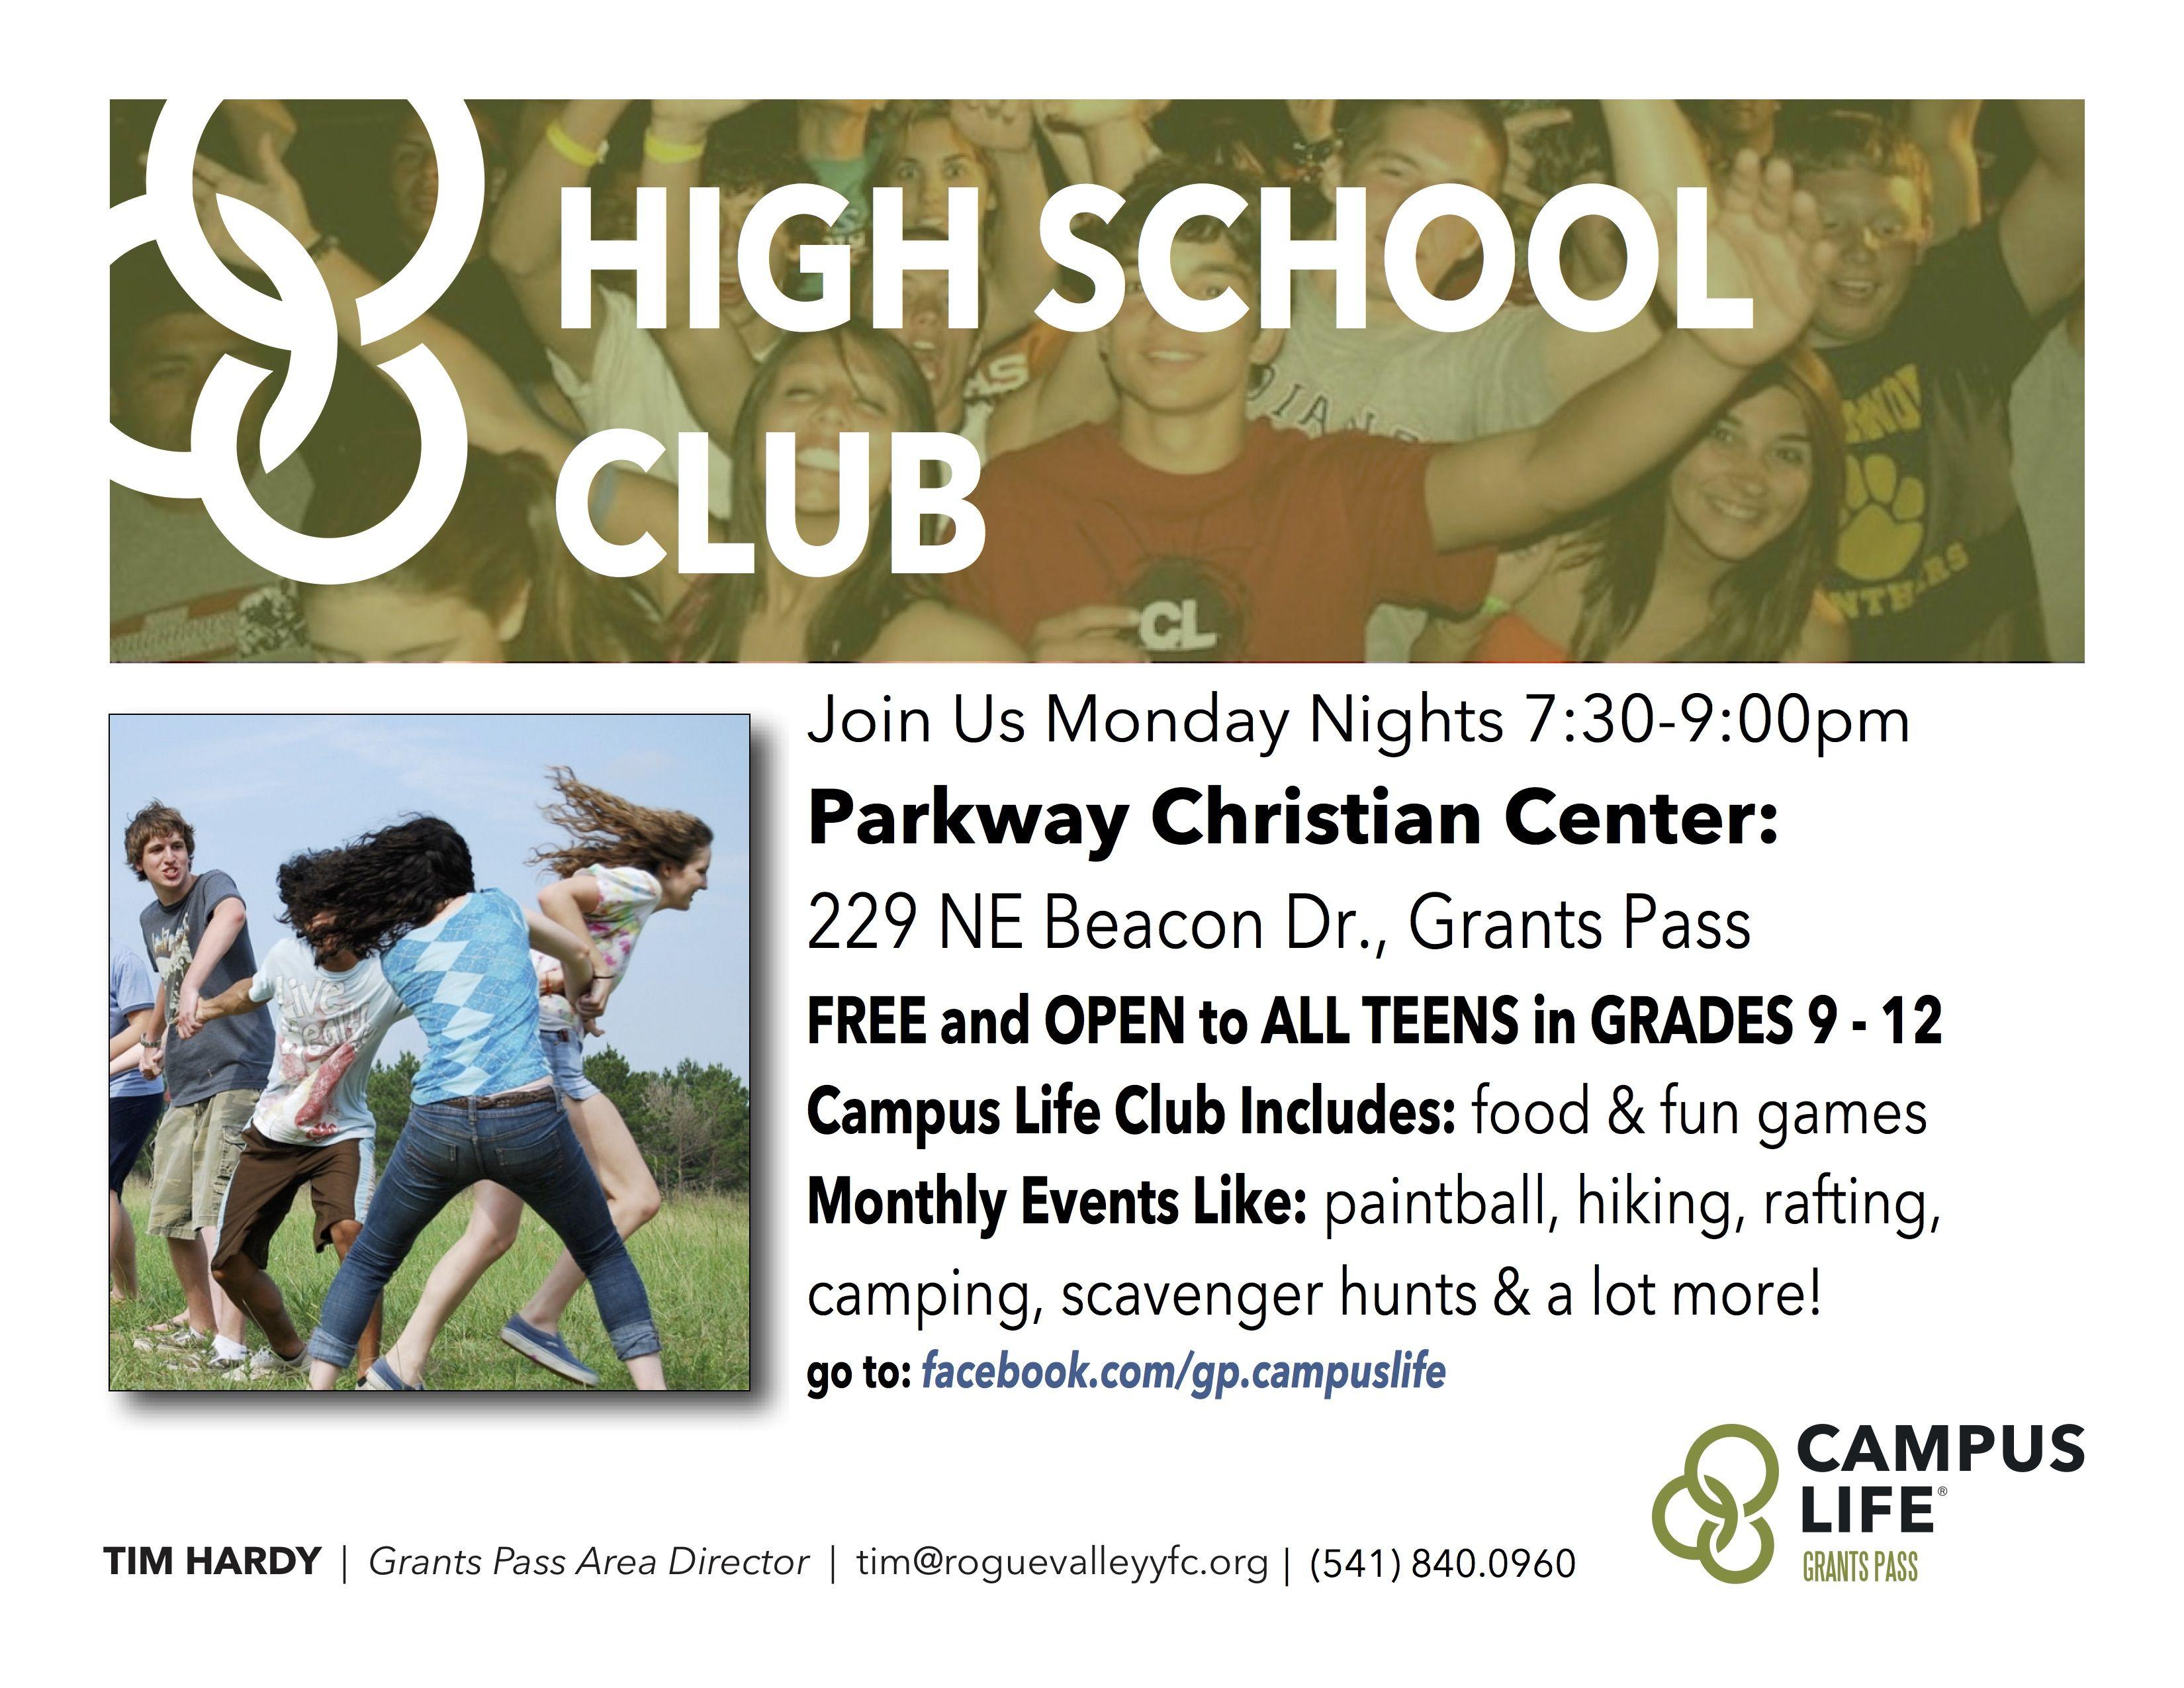 Grants Pass High School Club Campuslife Holidays Events